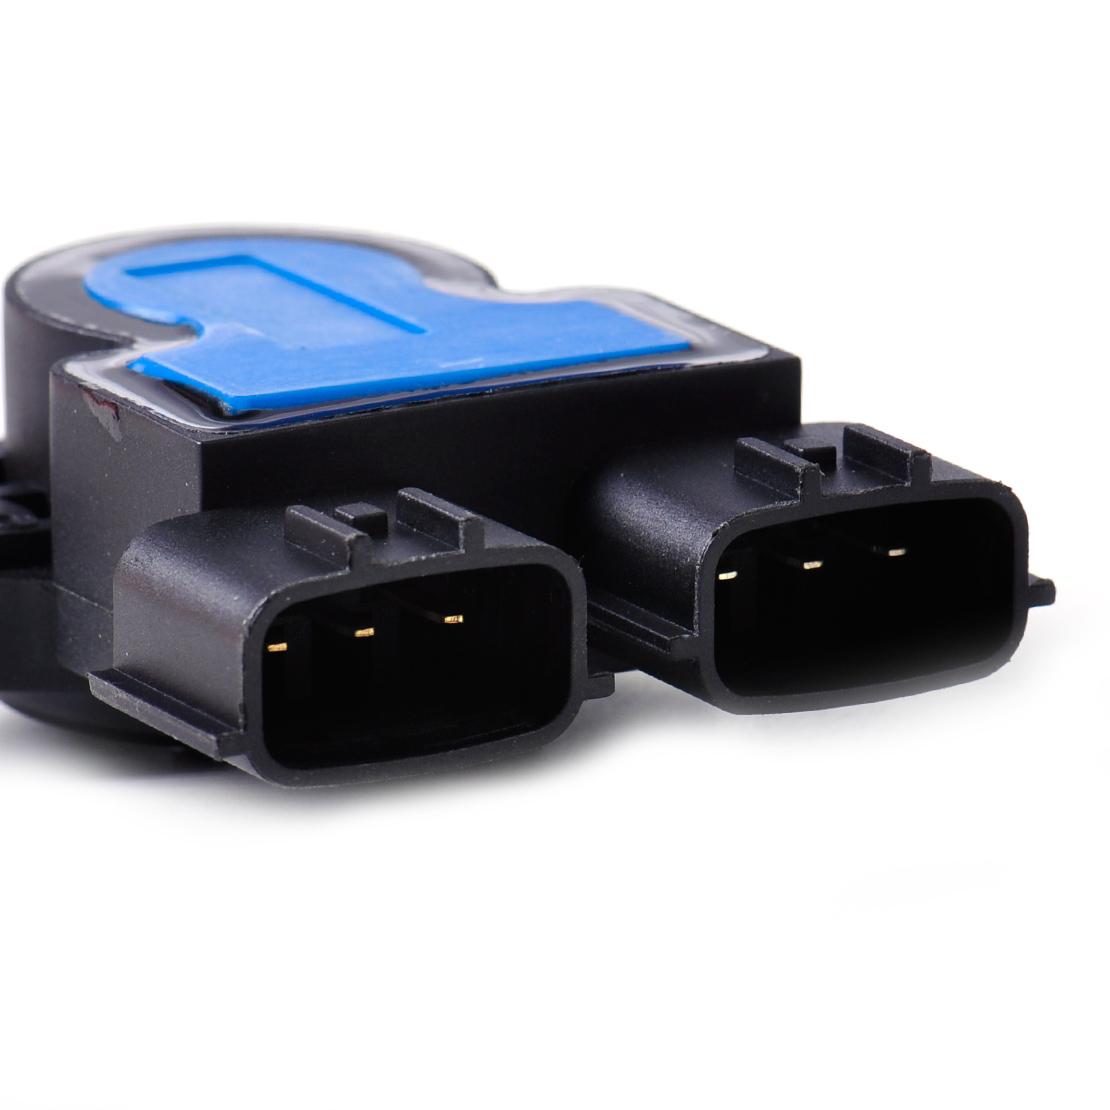 Throttle Position Sensor Price South Africa: Throttle Position Sensor TPS Fit Nissan Frontier Xterra